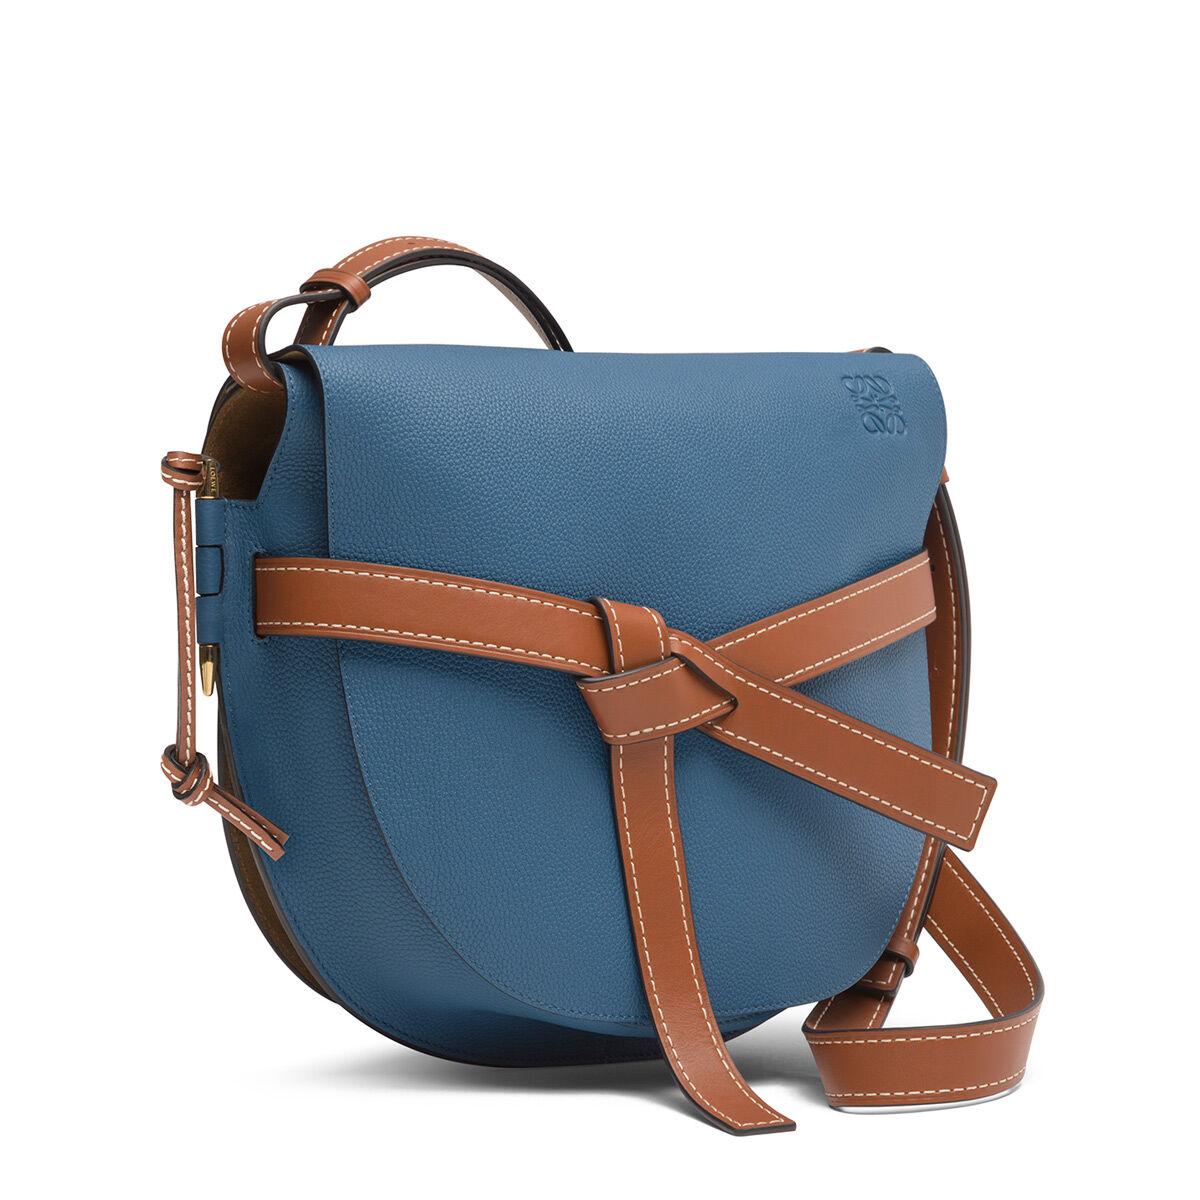 LOEWE ゲートバッグ Varsity Blue/Pecan Color all